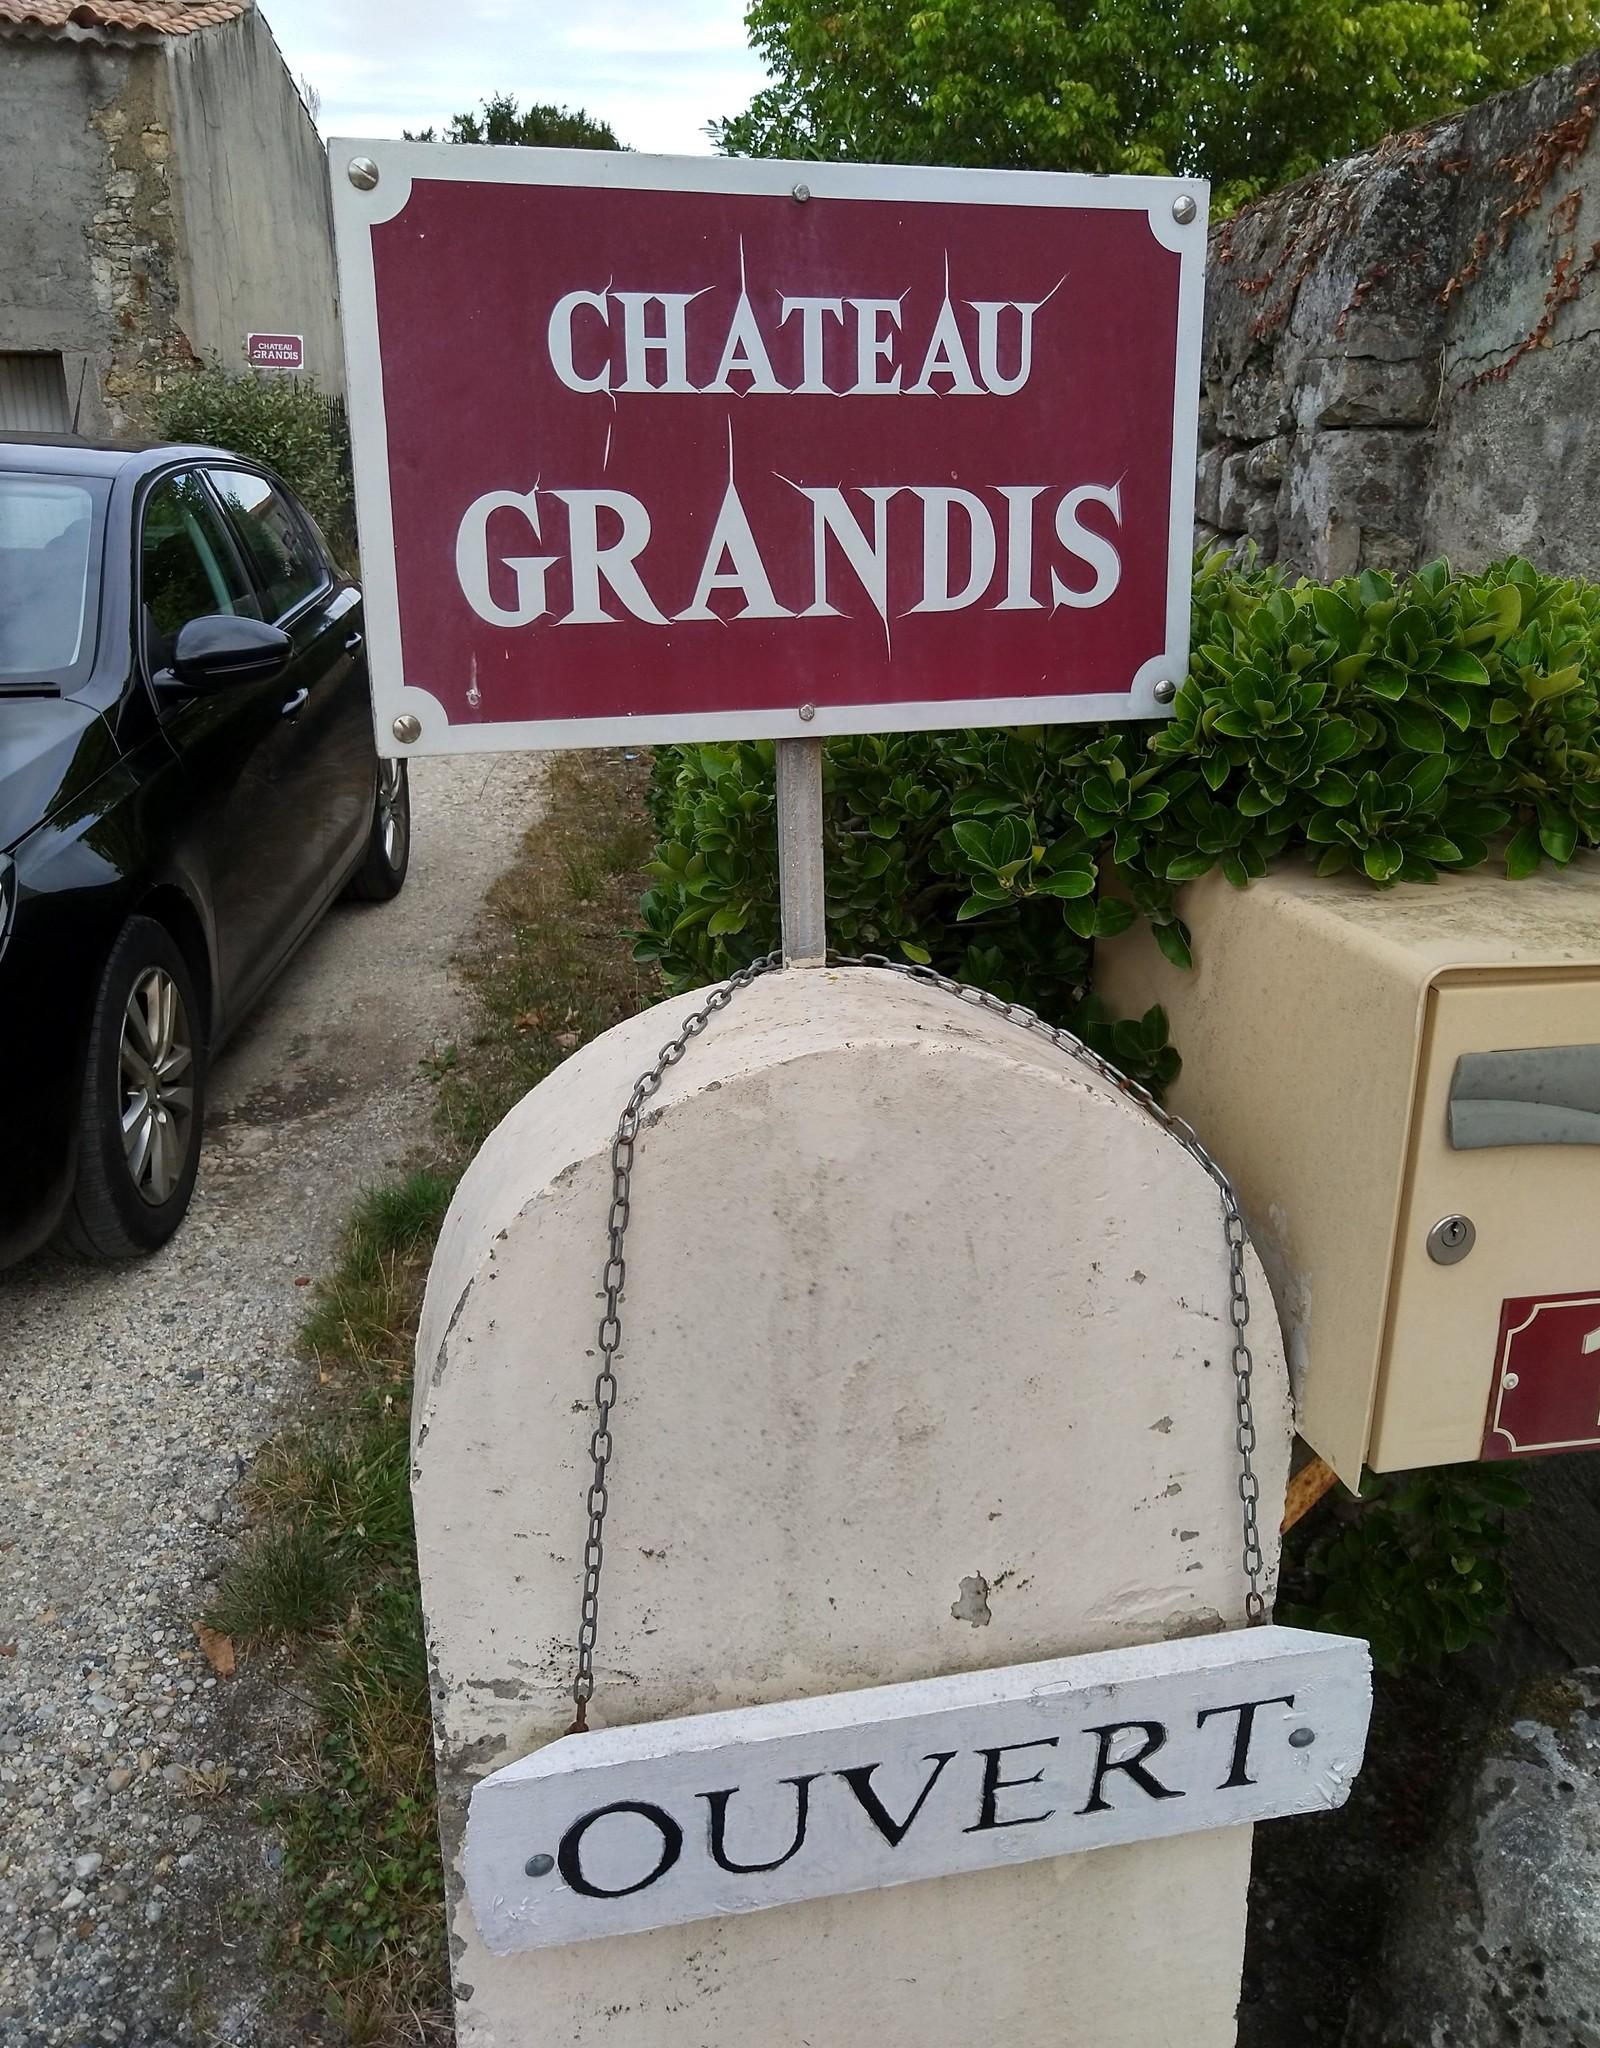 Chateau Grandis 2010, Haut Medoc